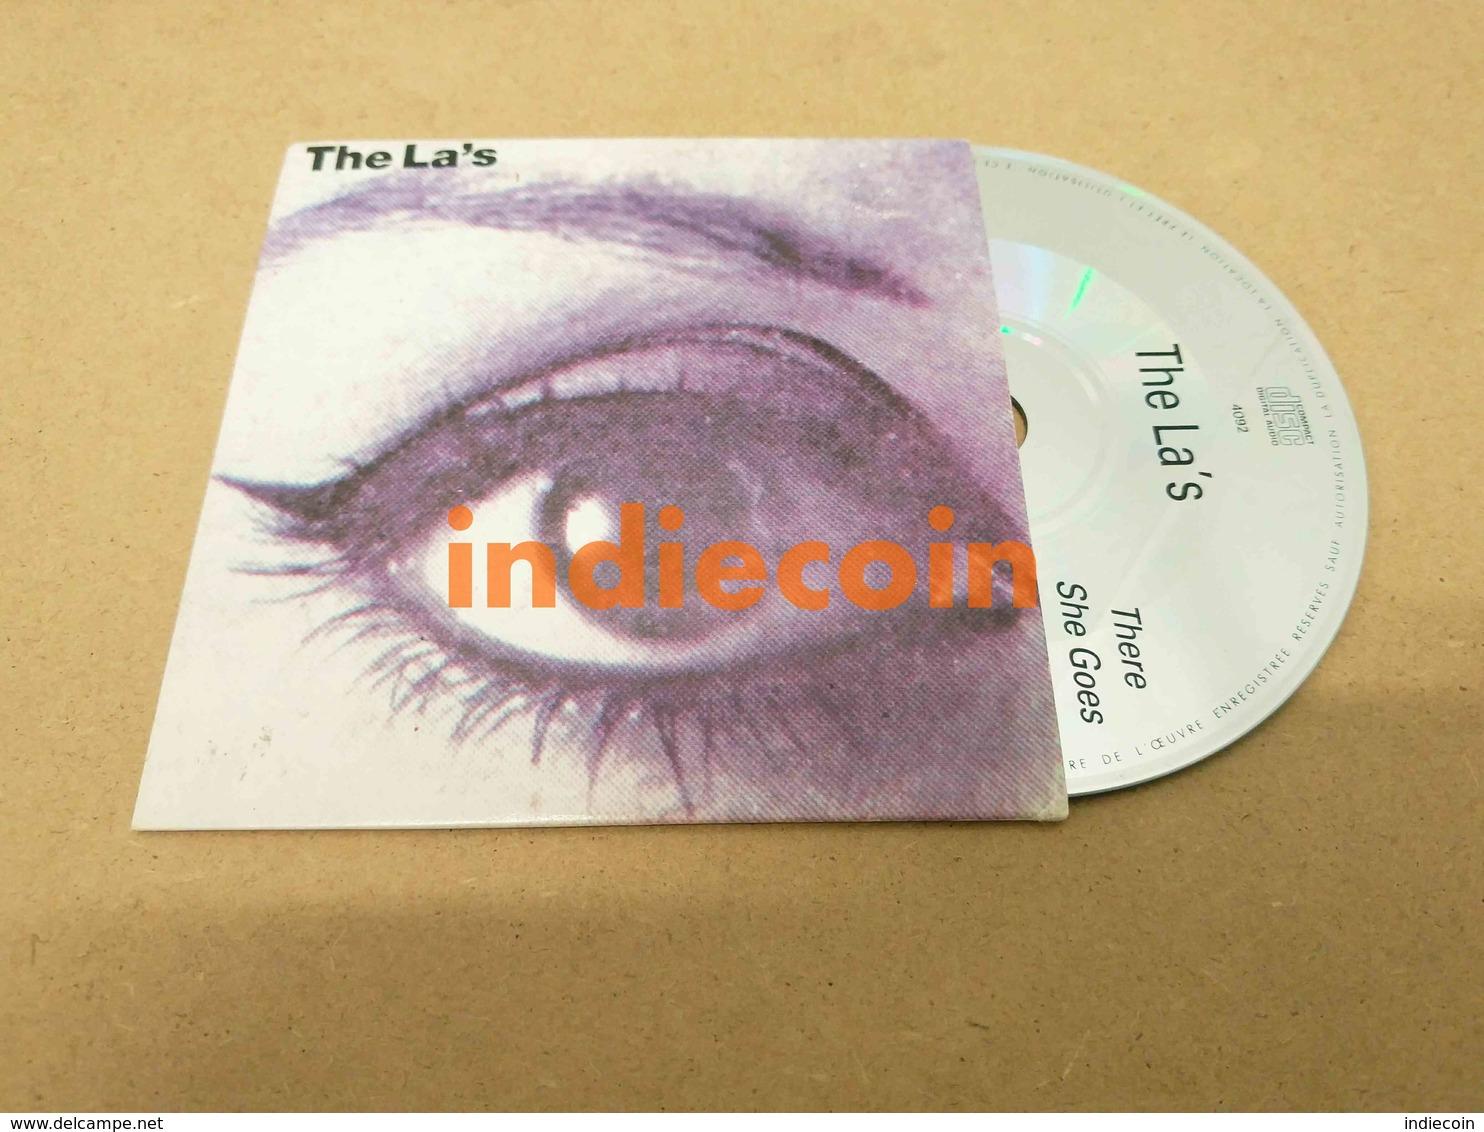 LA'S There She Goes 1991 FRANCE CD LP Promo 4 Titres Live AuxTransMusicales De Rennes Cardsleeve - Music & Instruments